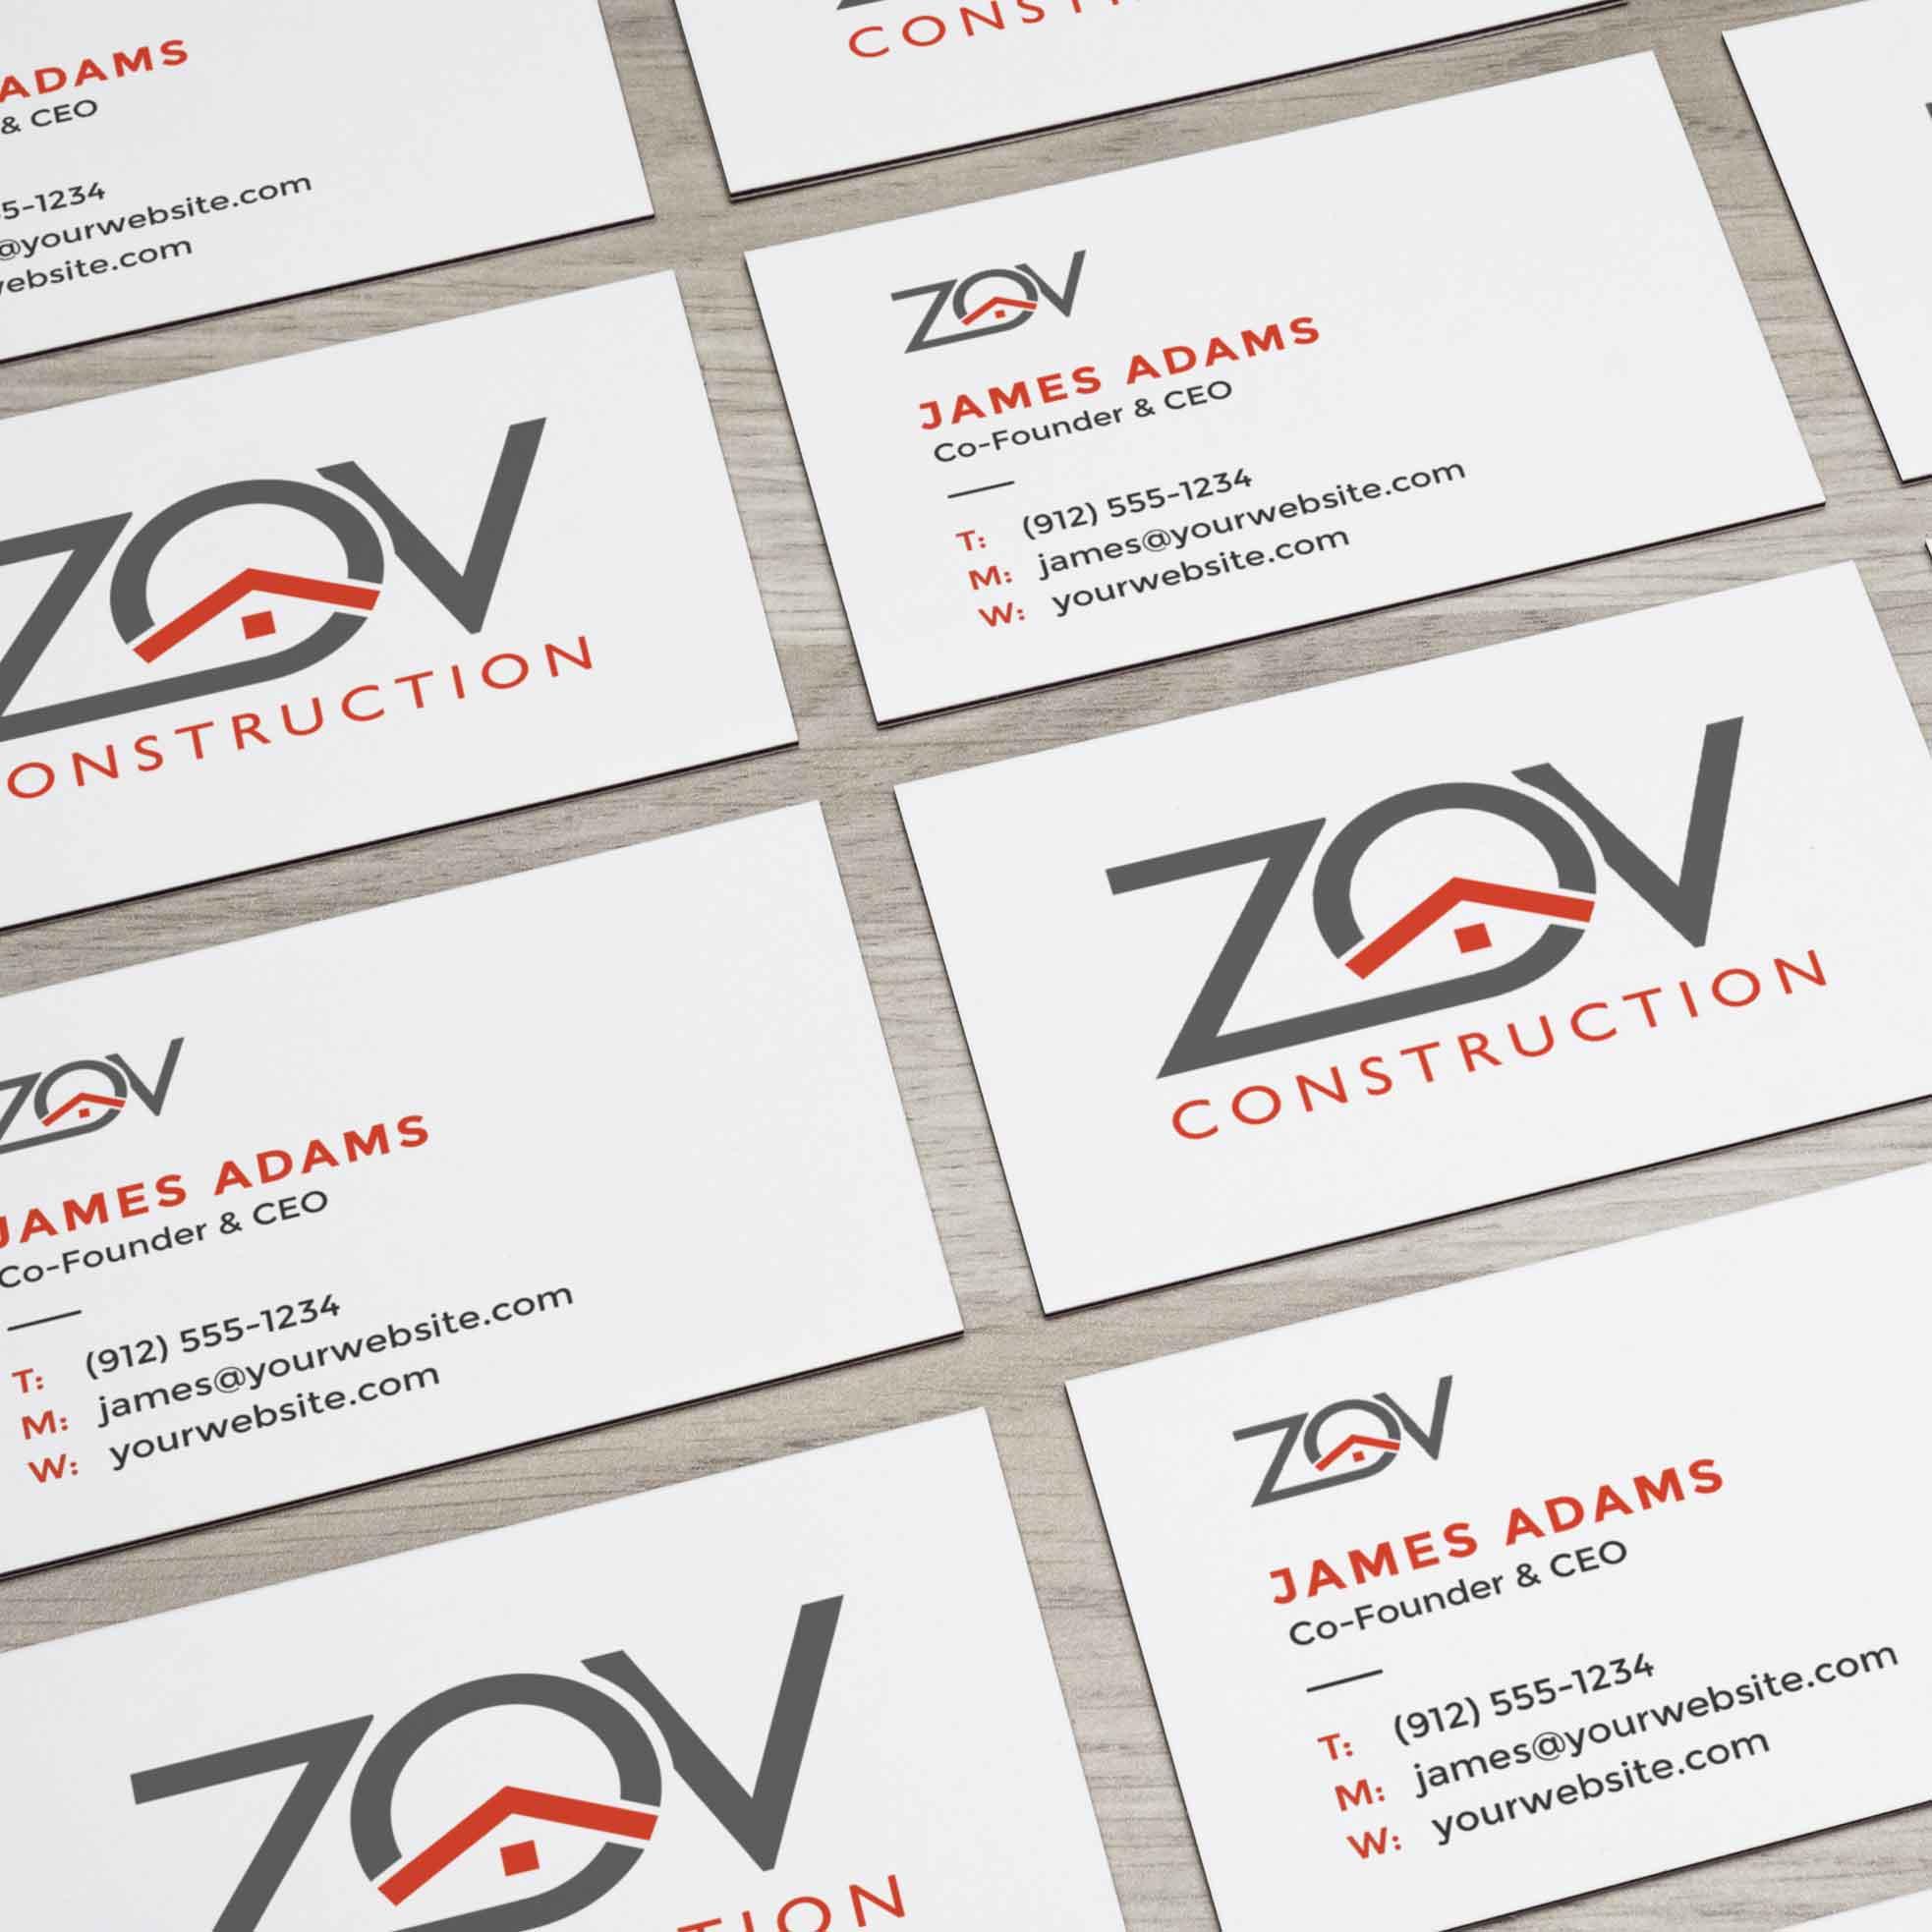 logo design service for ZQV Construction